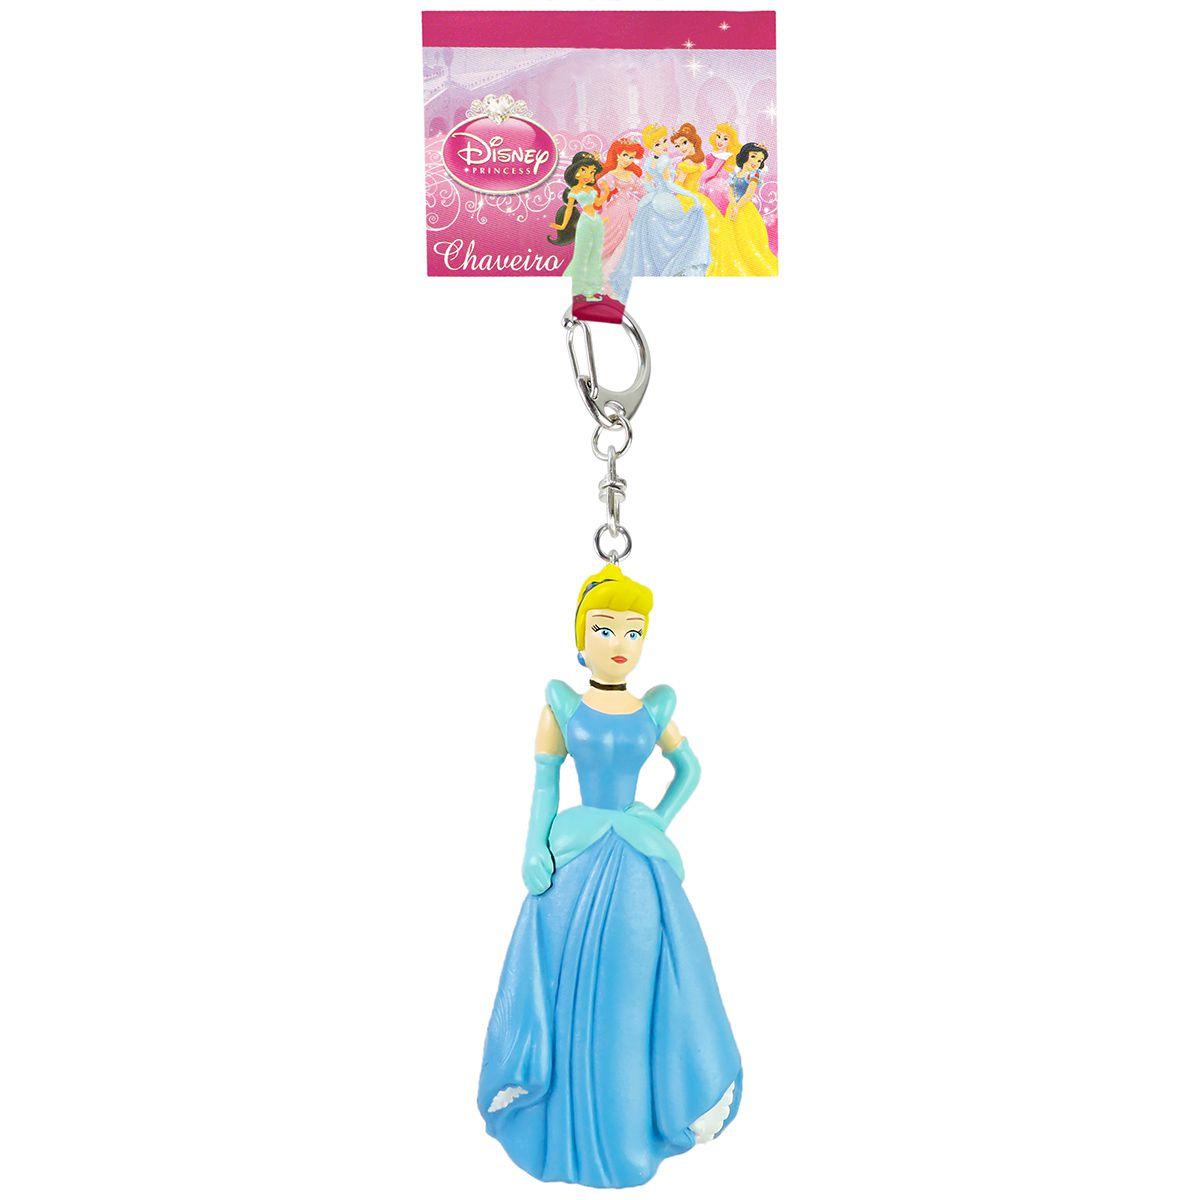 Chaveiro Cinderela Princesas Disney